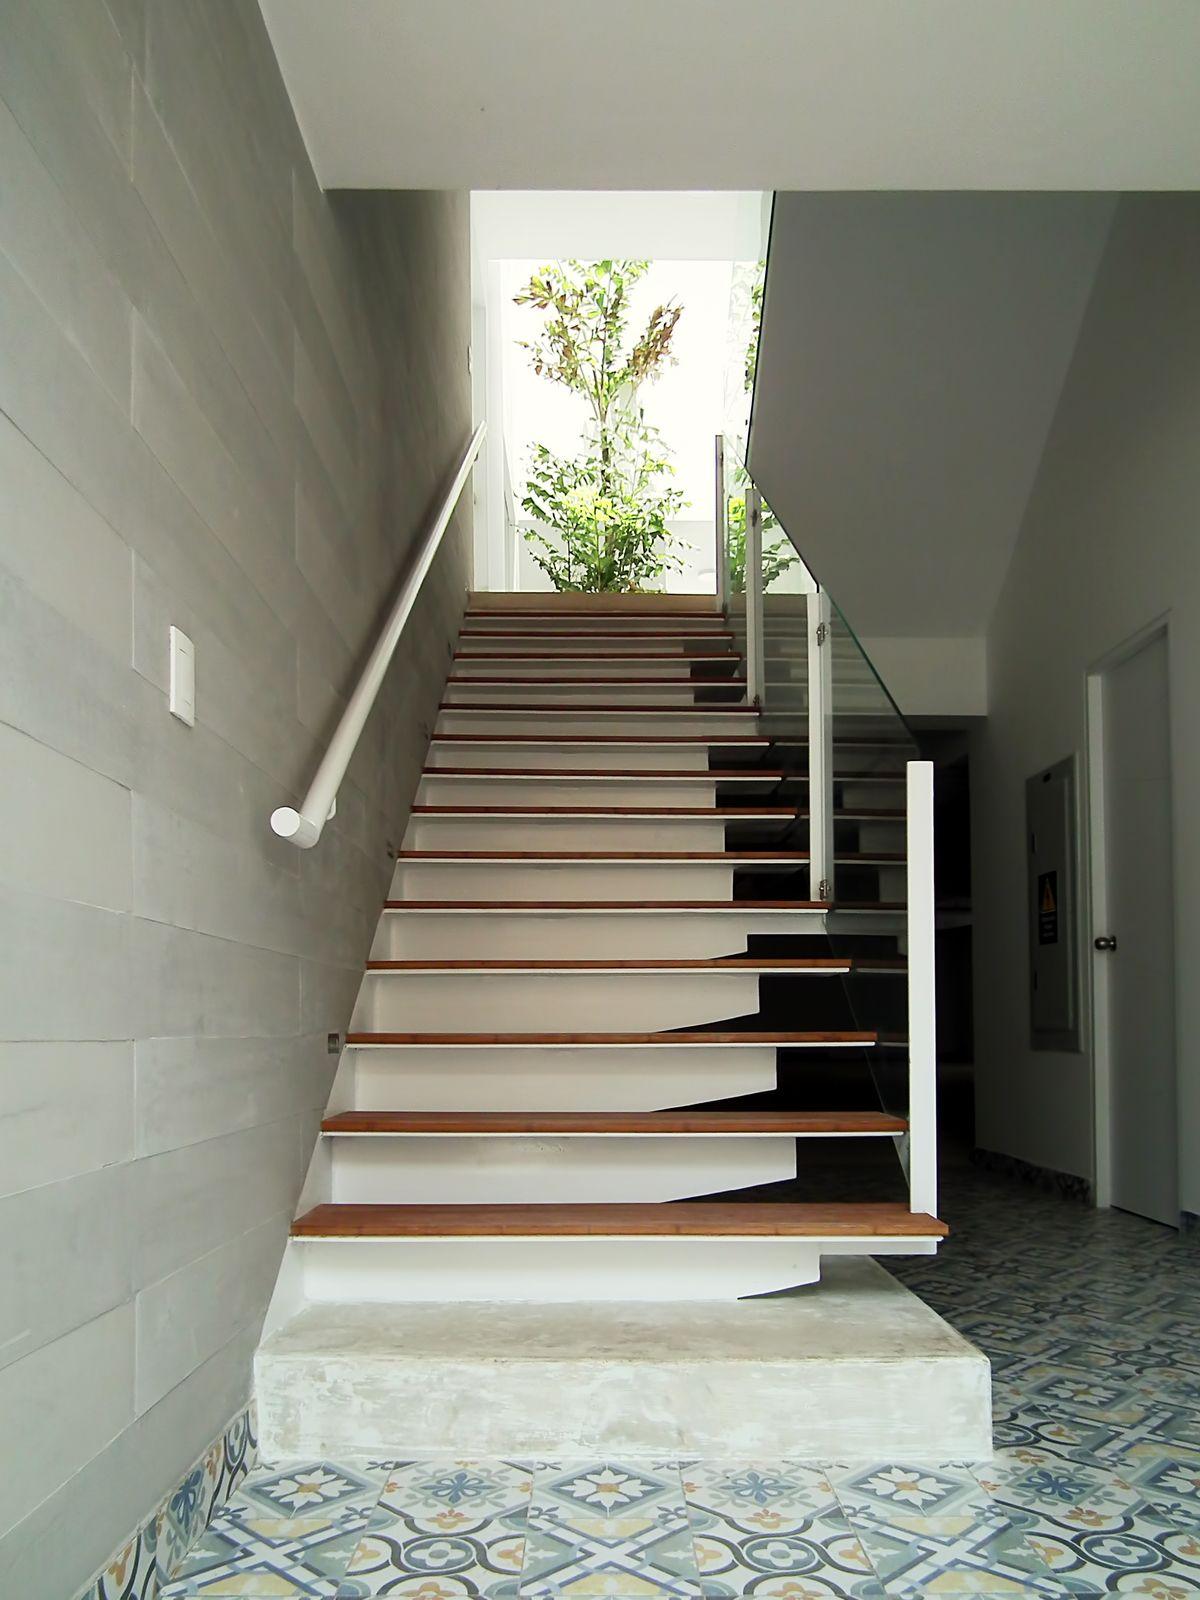 Dise o multifamiliar punta hermosa escalera de ingreso for Diseno de interiores lima